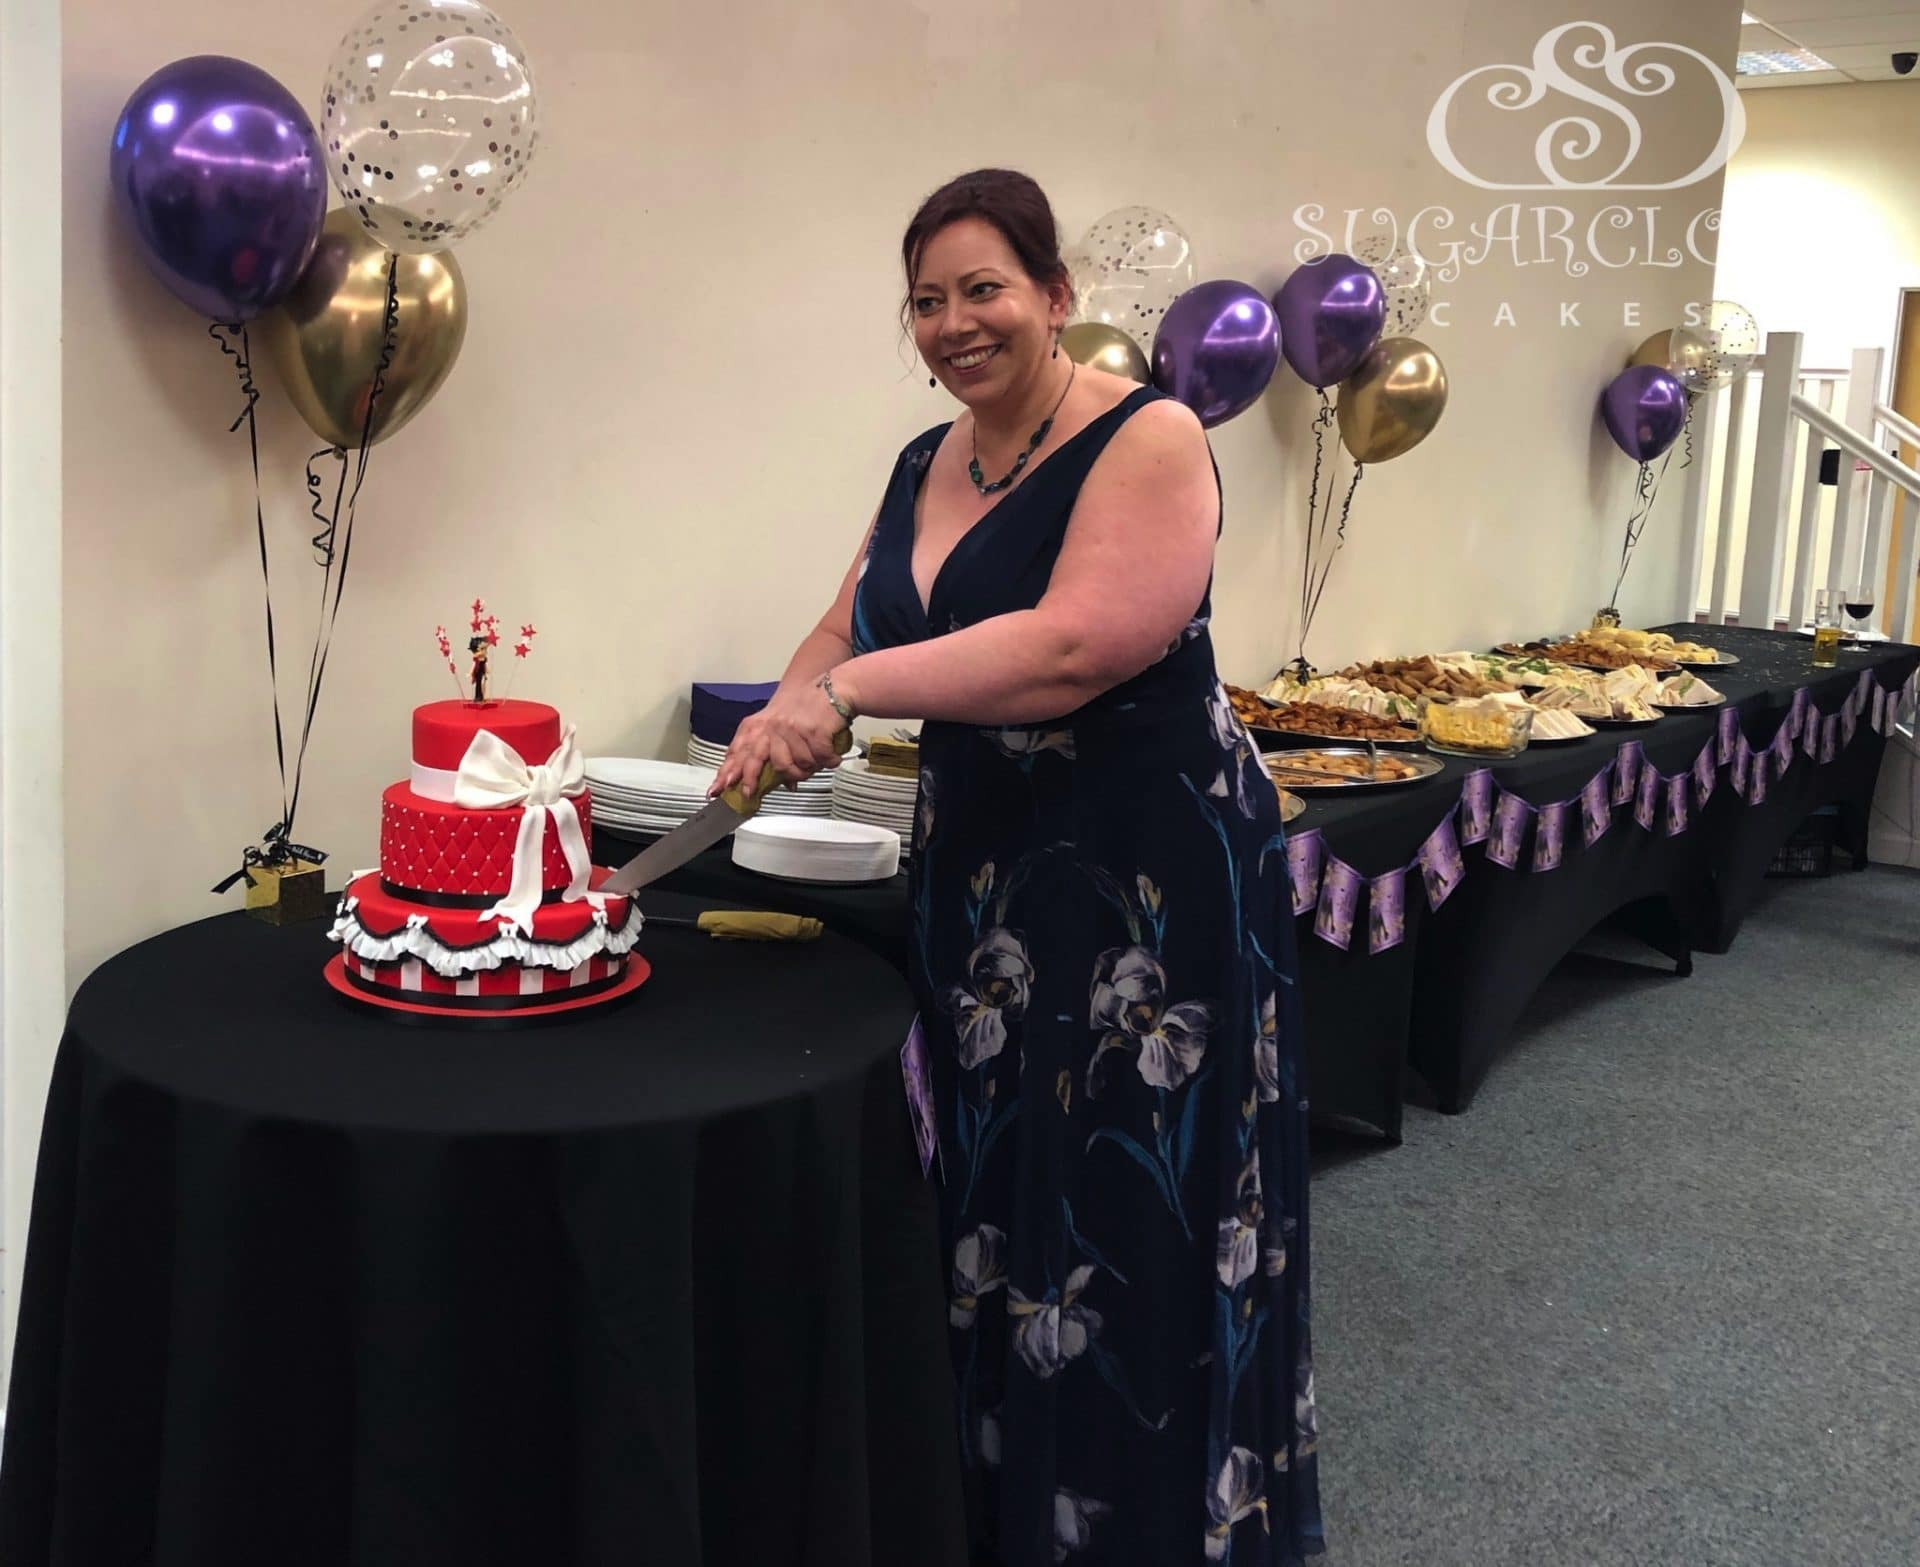 Jo cutting her cake